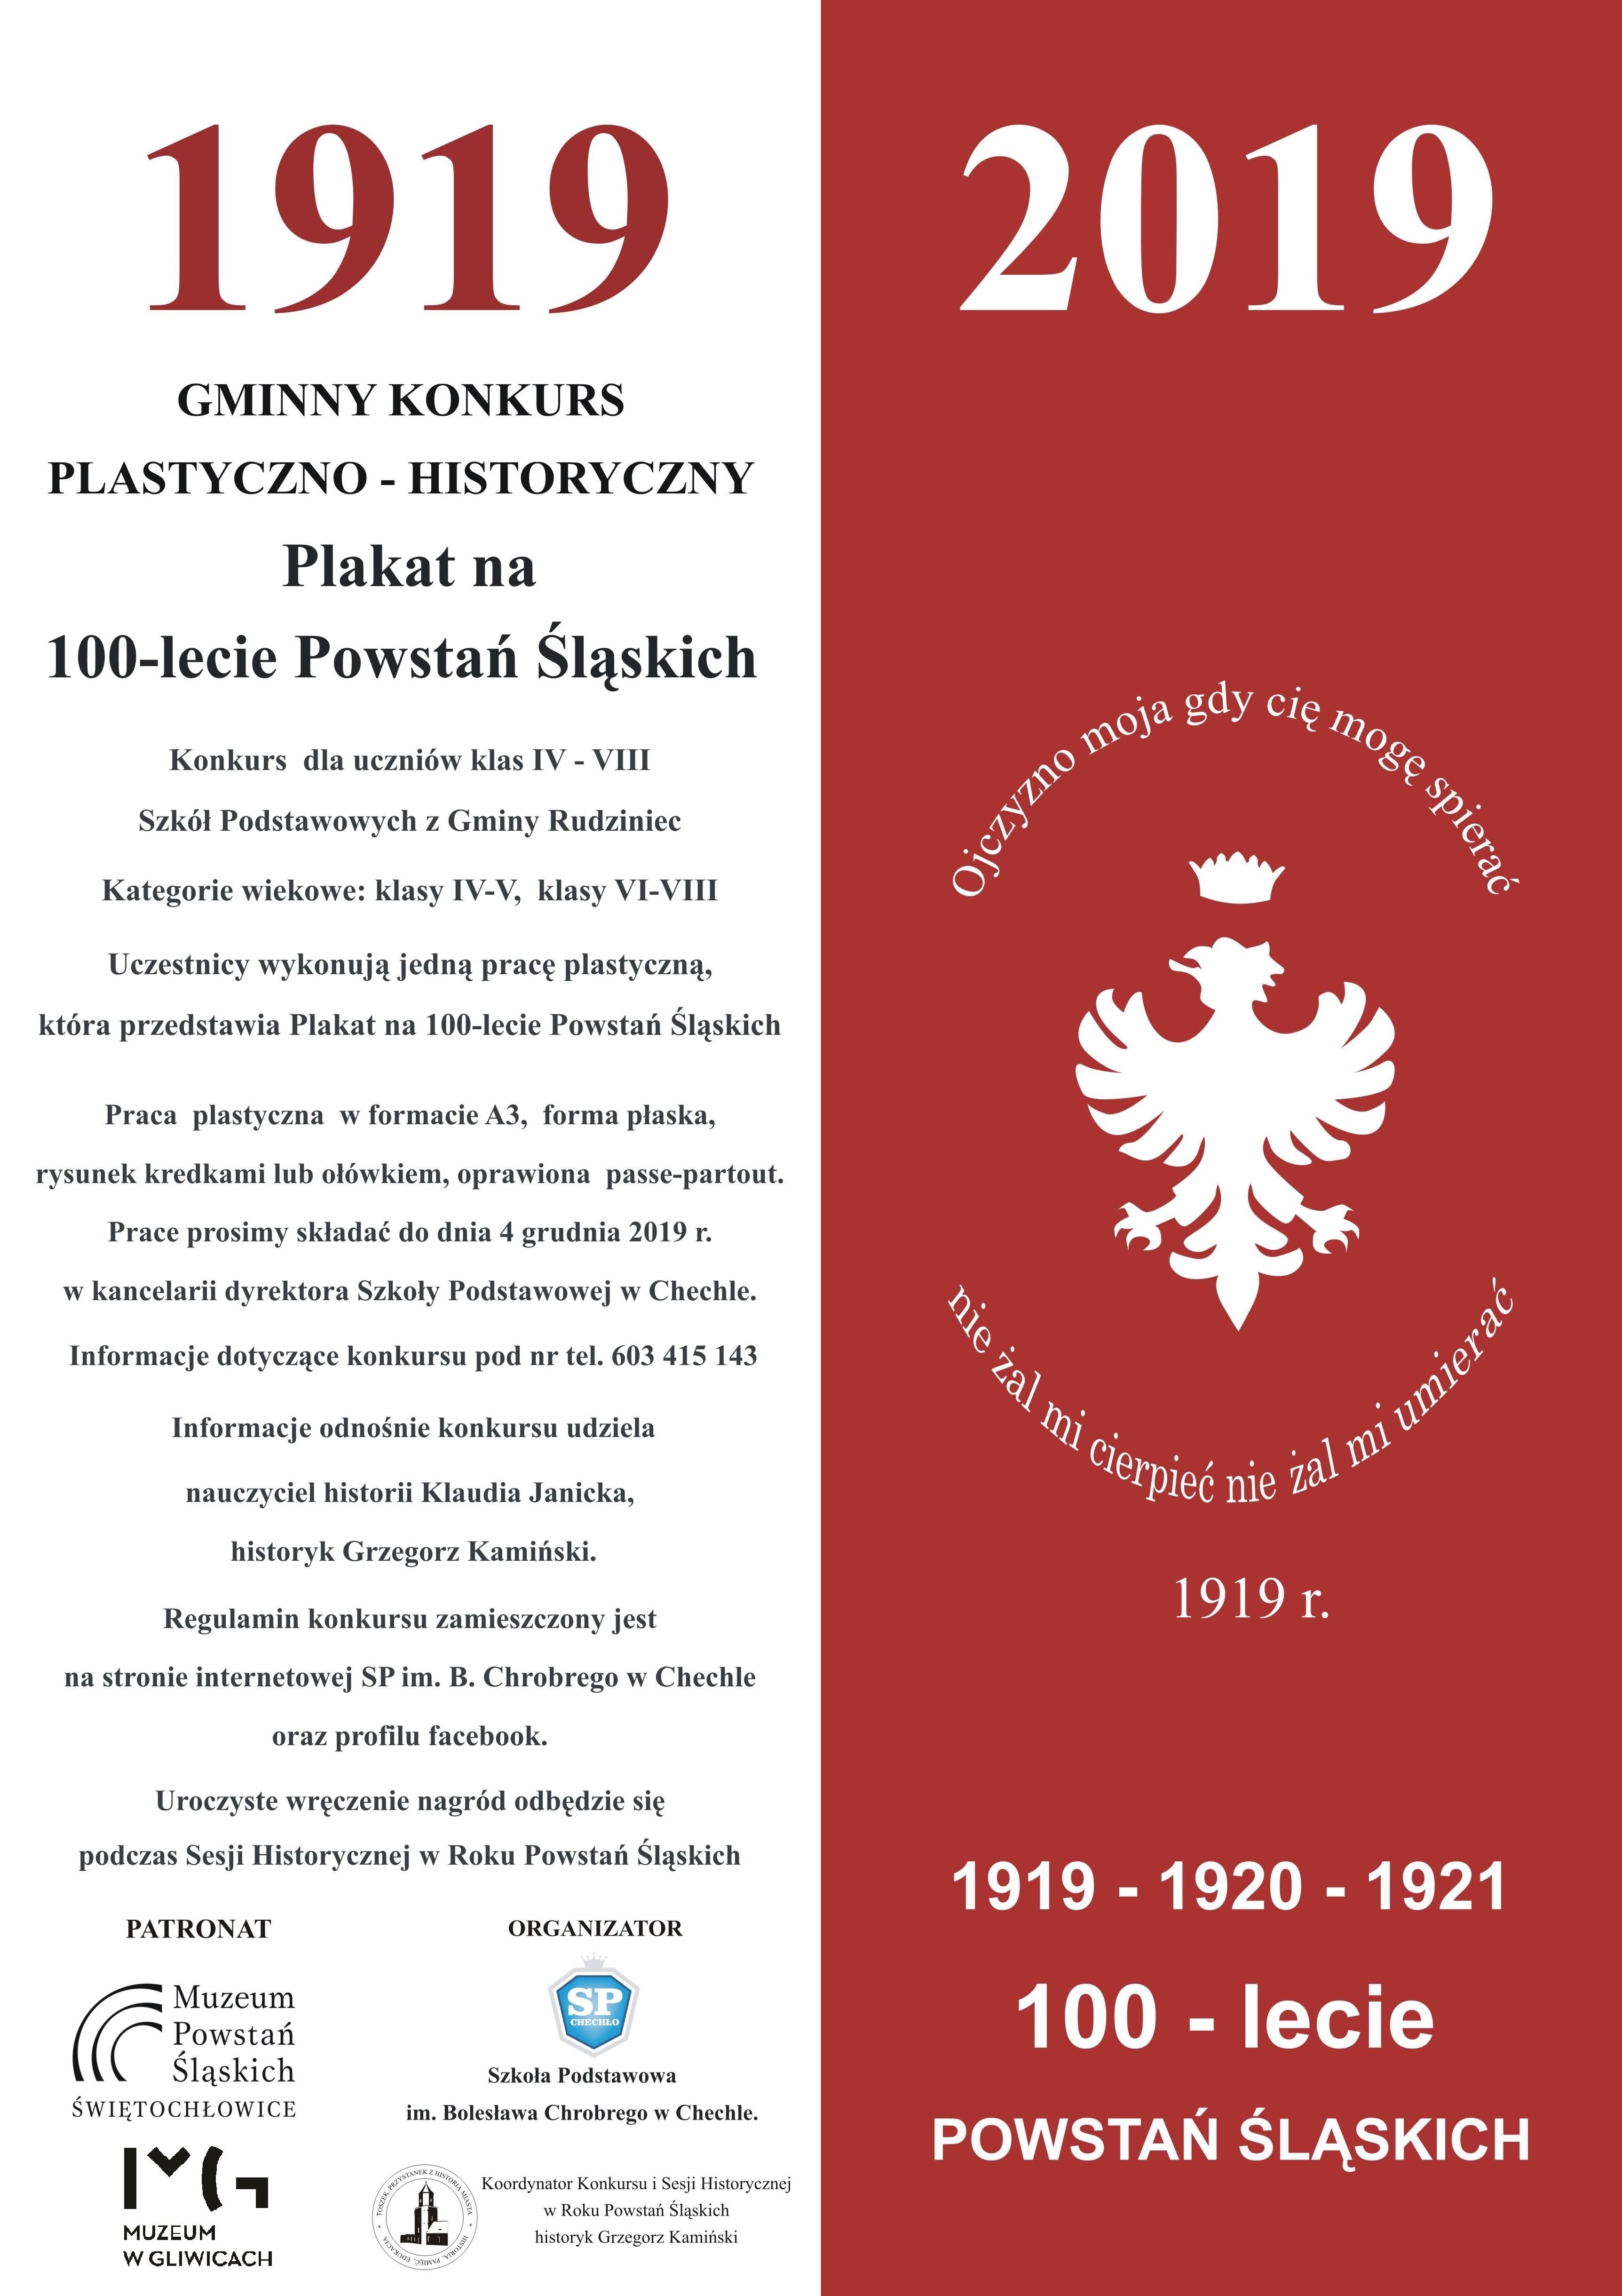 SP Chechlo konkurs gminny Plakat 100 lecie Powstan Slaskich 2019 A3